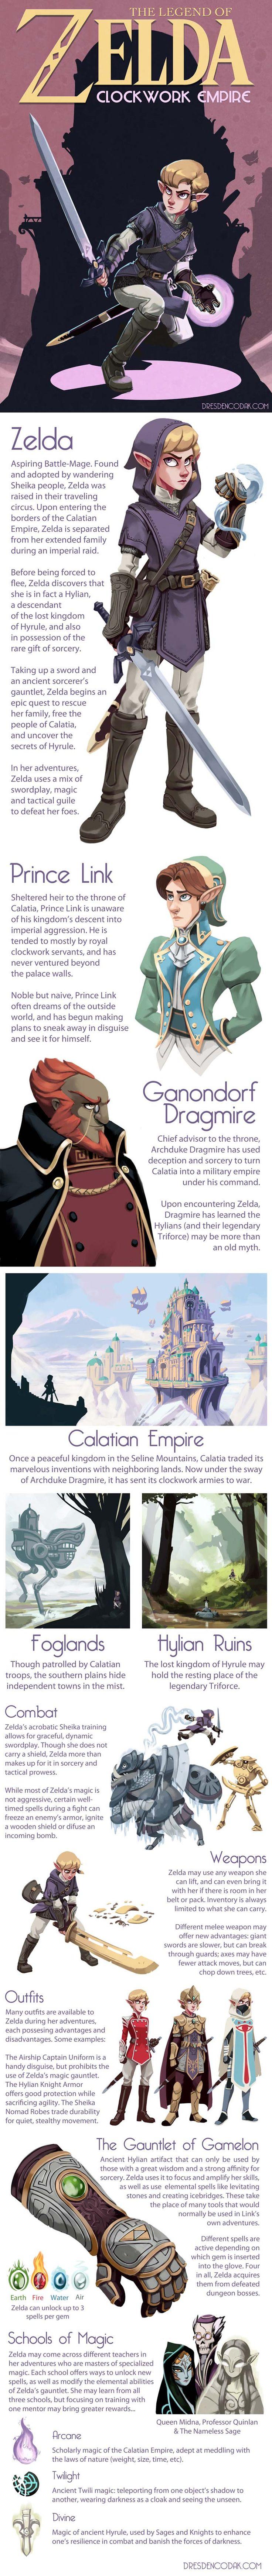 The Legend of Zelda: Clockwork Empire --- Interesting. It's a feminist take on the Zelda series. ITS ACTUALLY THE LEGEND OF ZELDA! (Not the Legend of Link :P ) I'd play it.